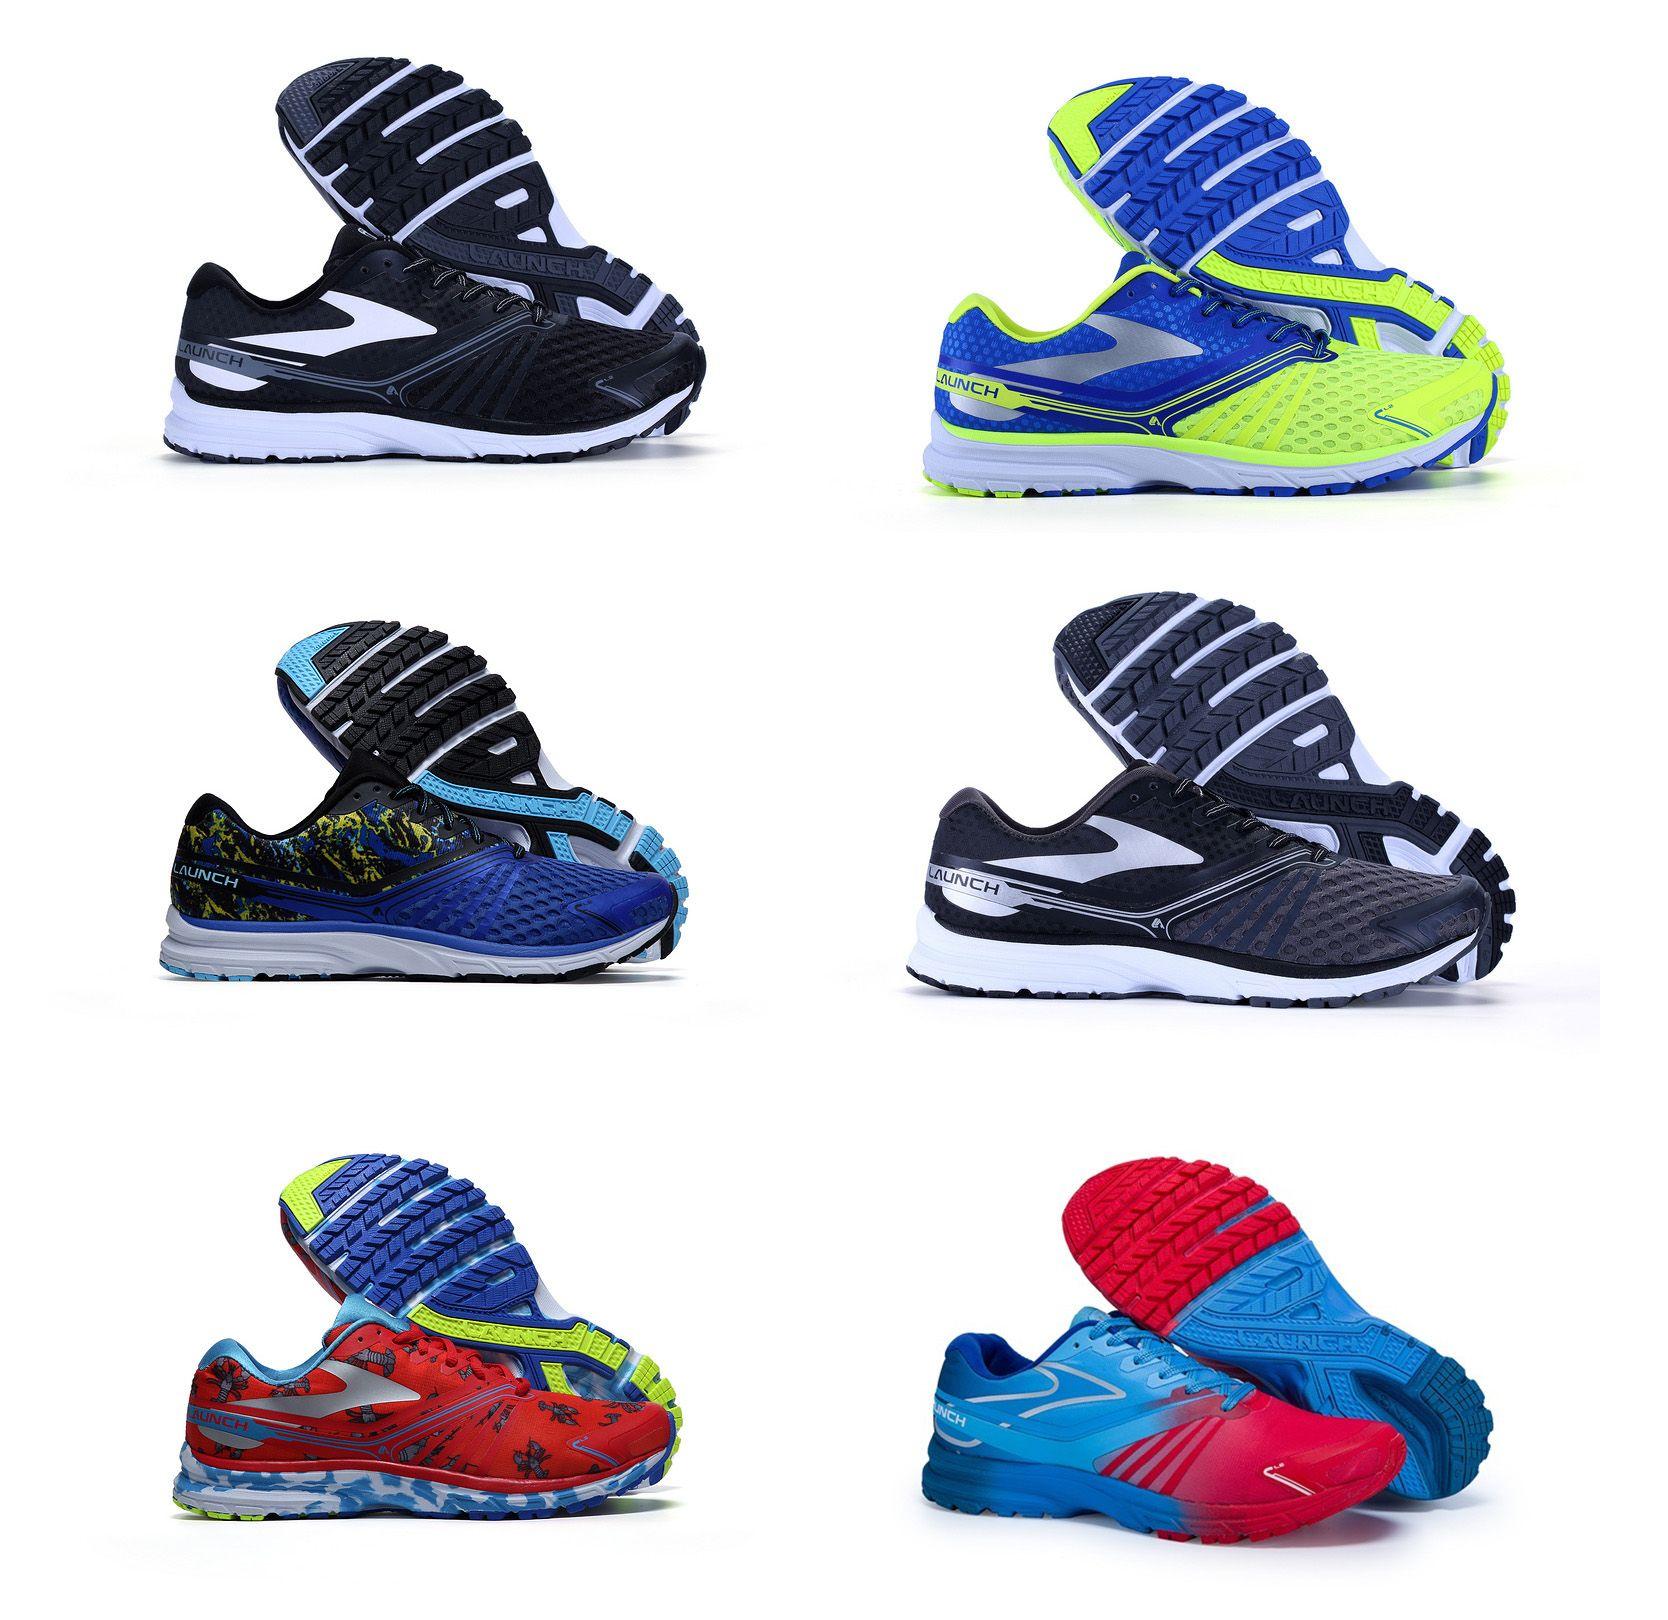 Original BROOKS Launch 2 Running Shoes